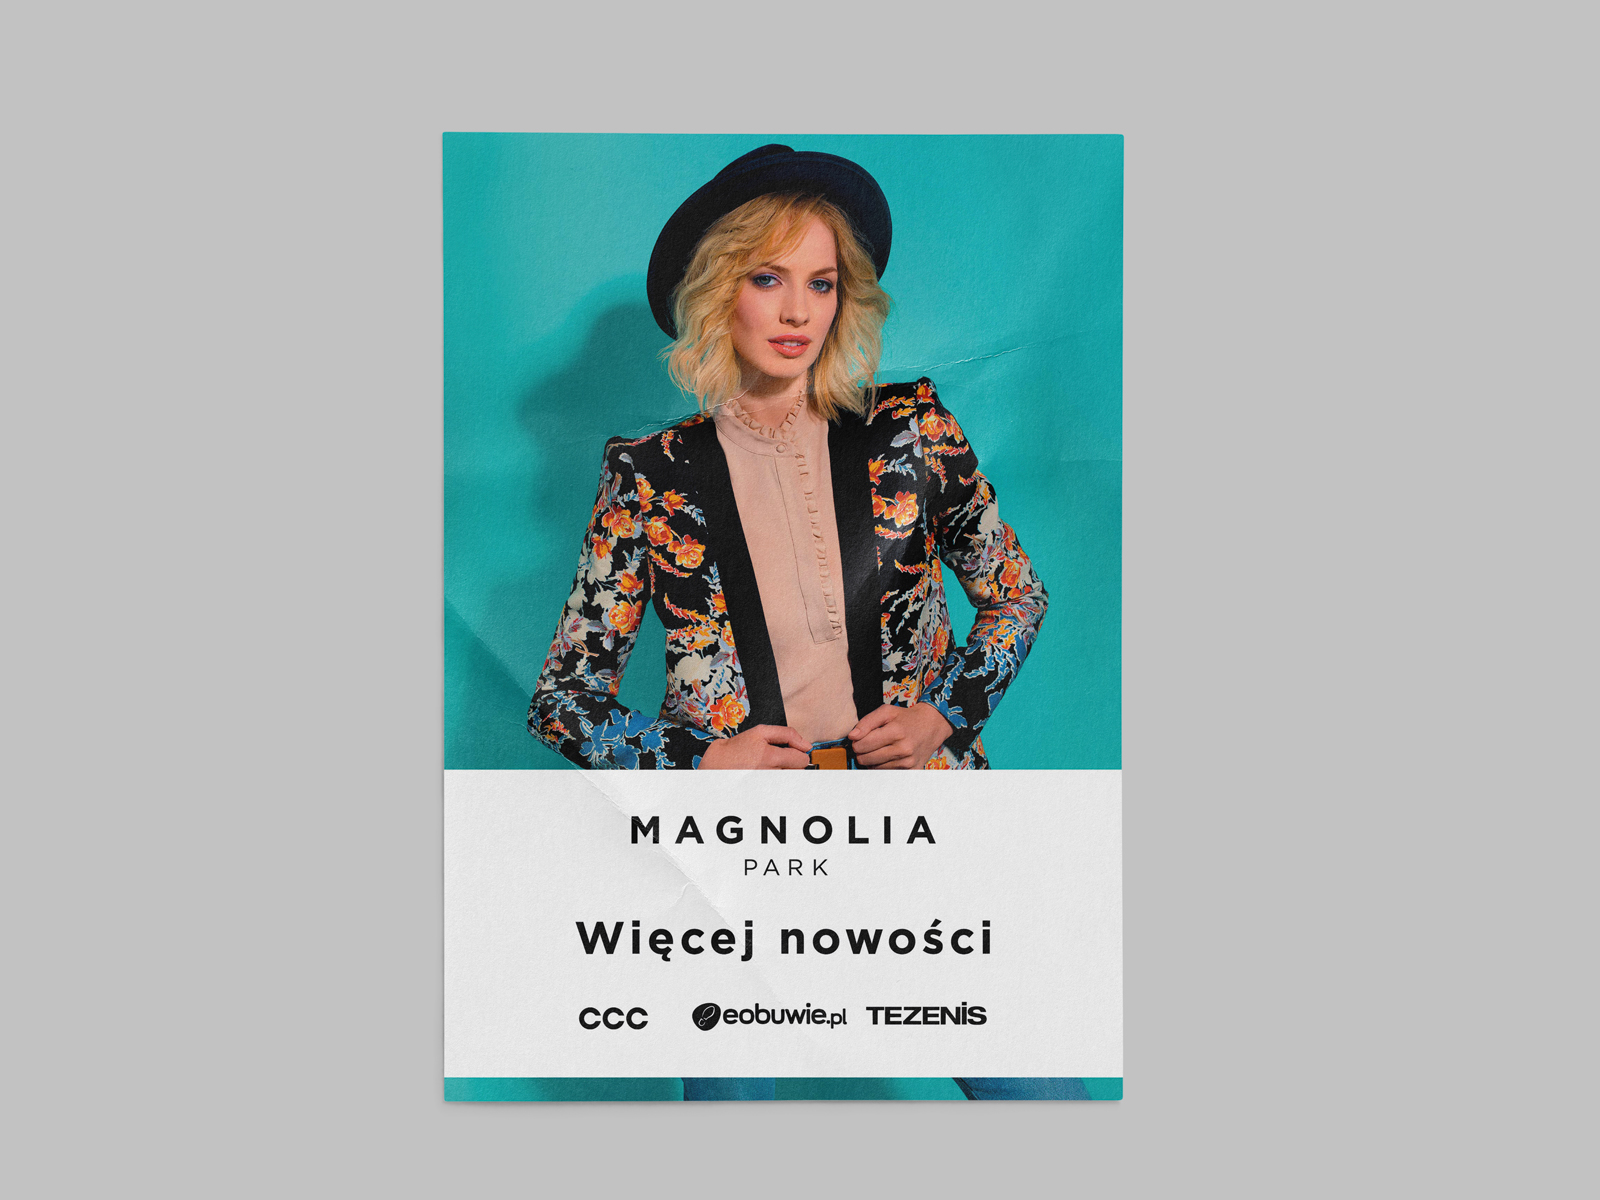 magnolia_new_5